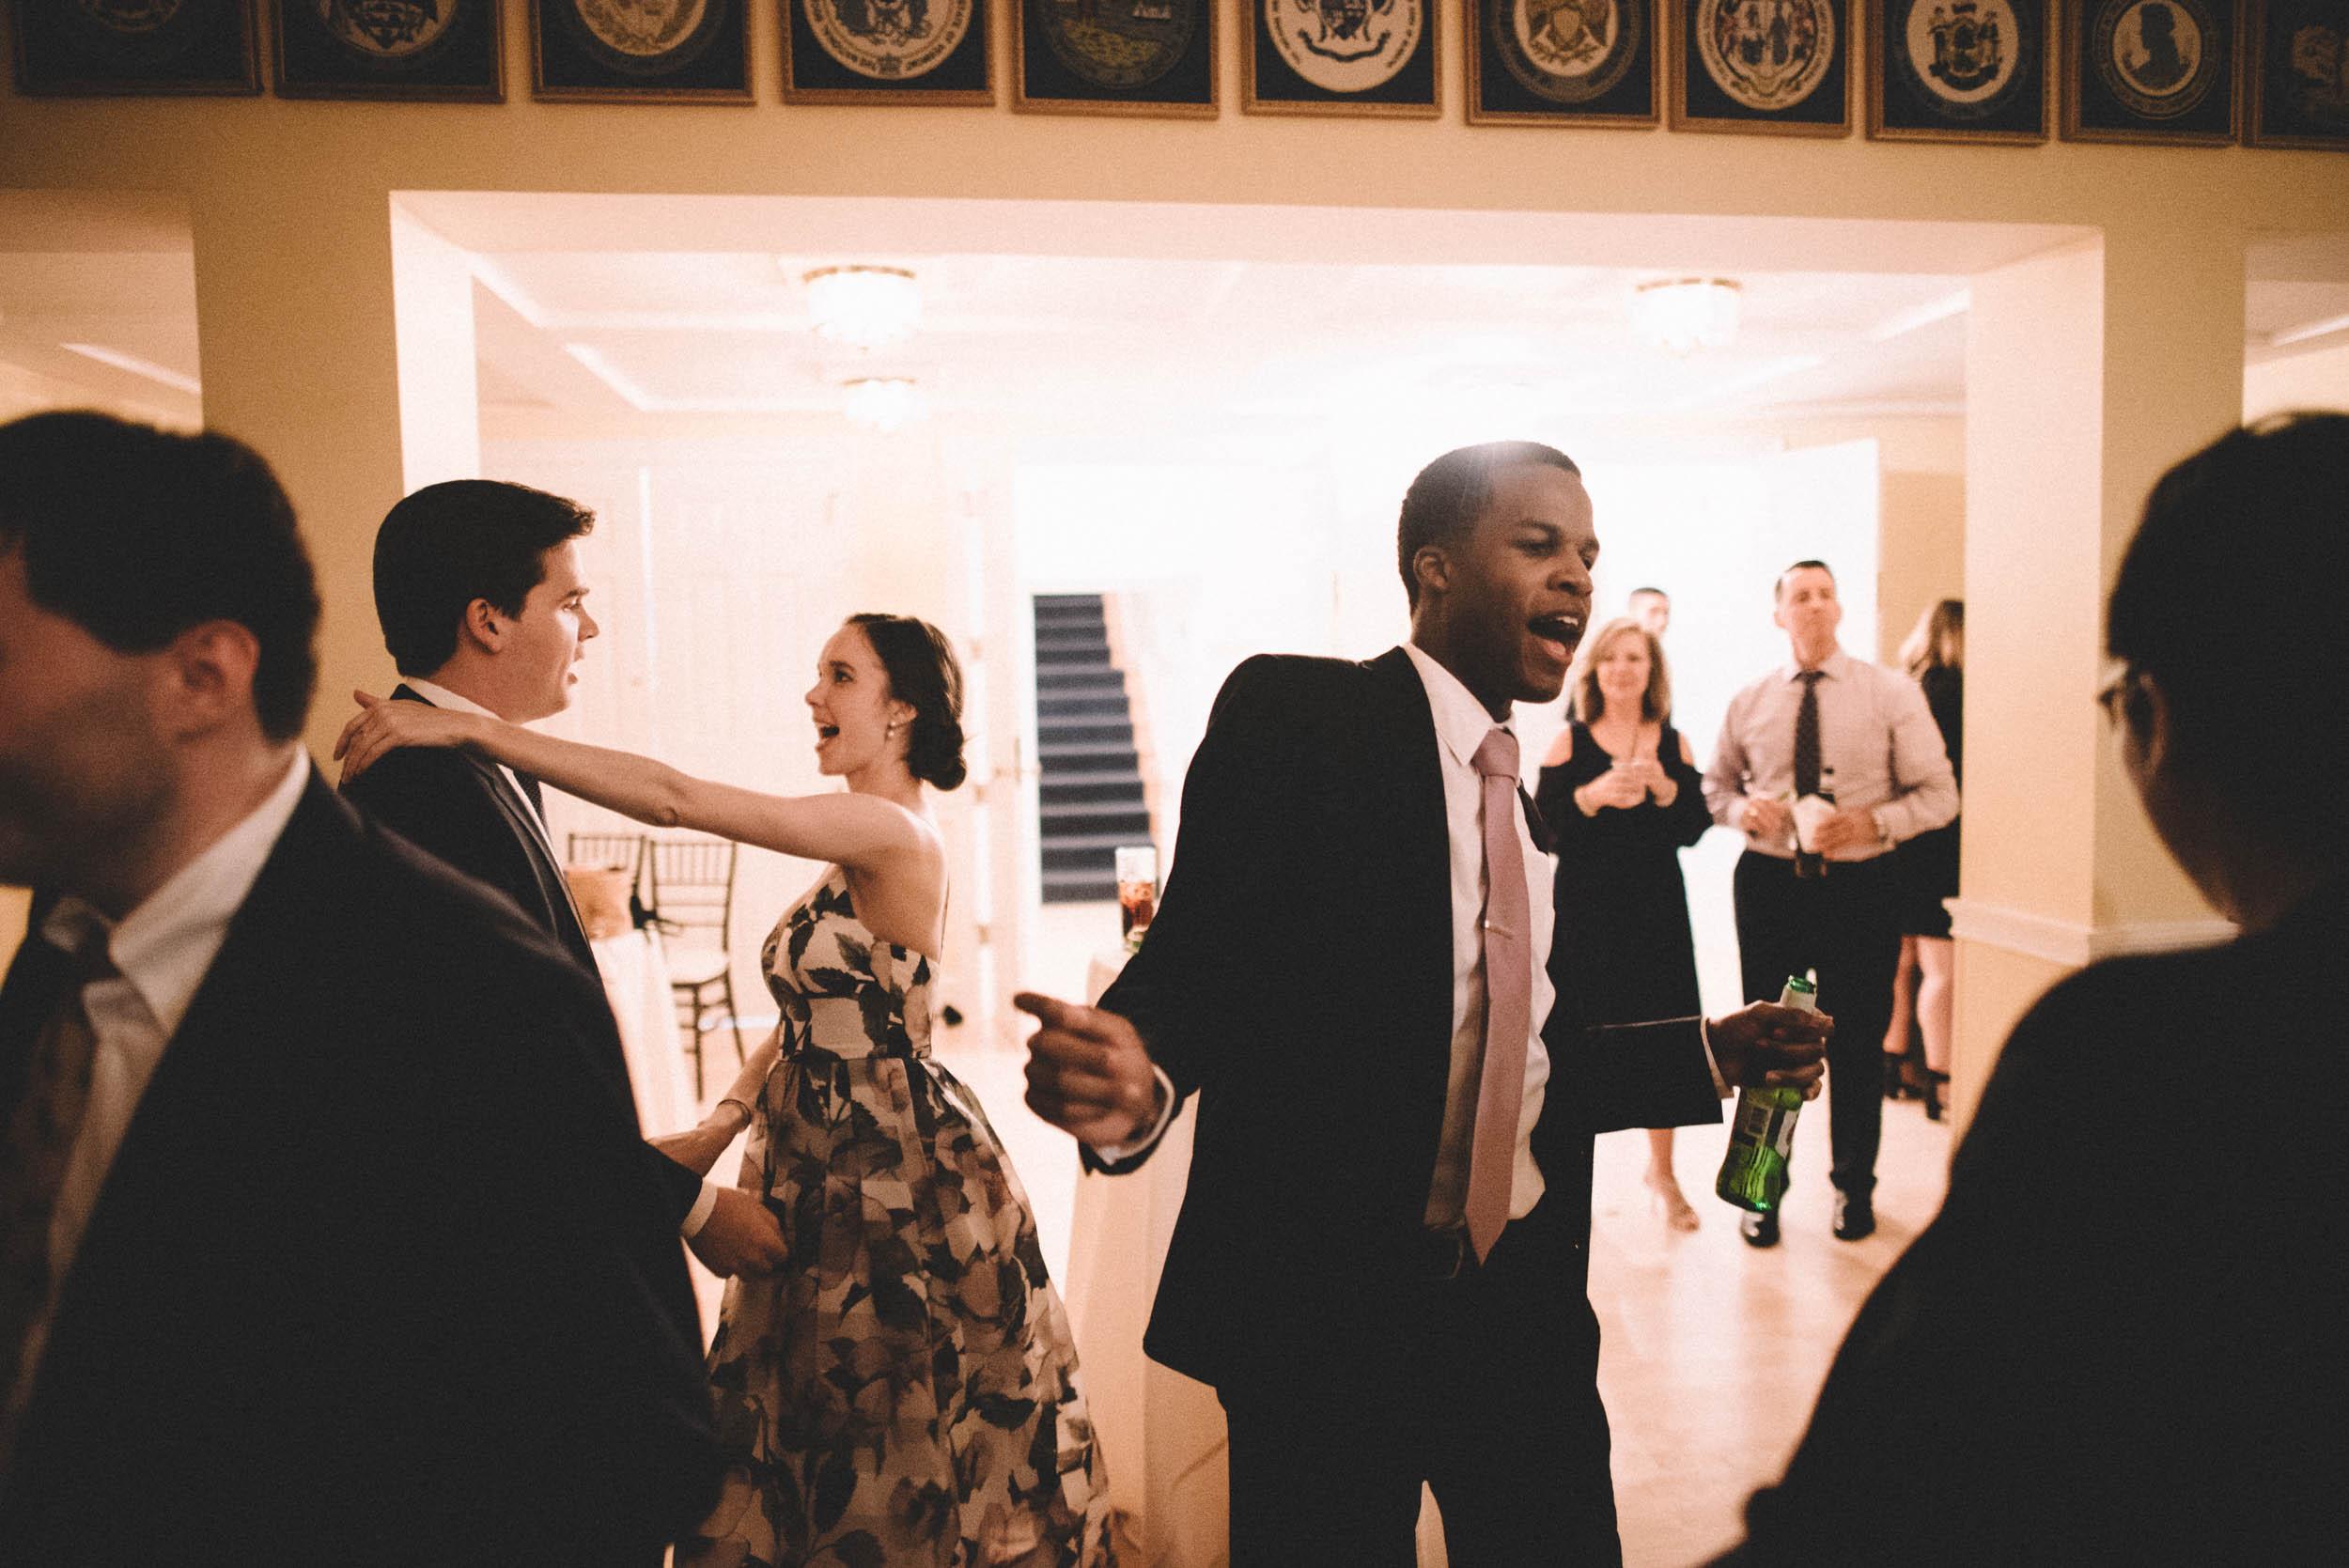 Dumbarton-House-wedding-101.jpg